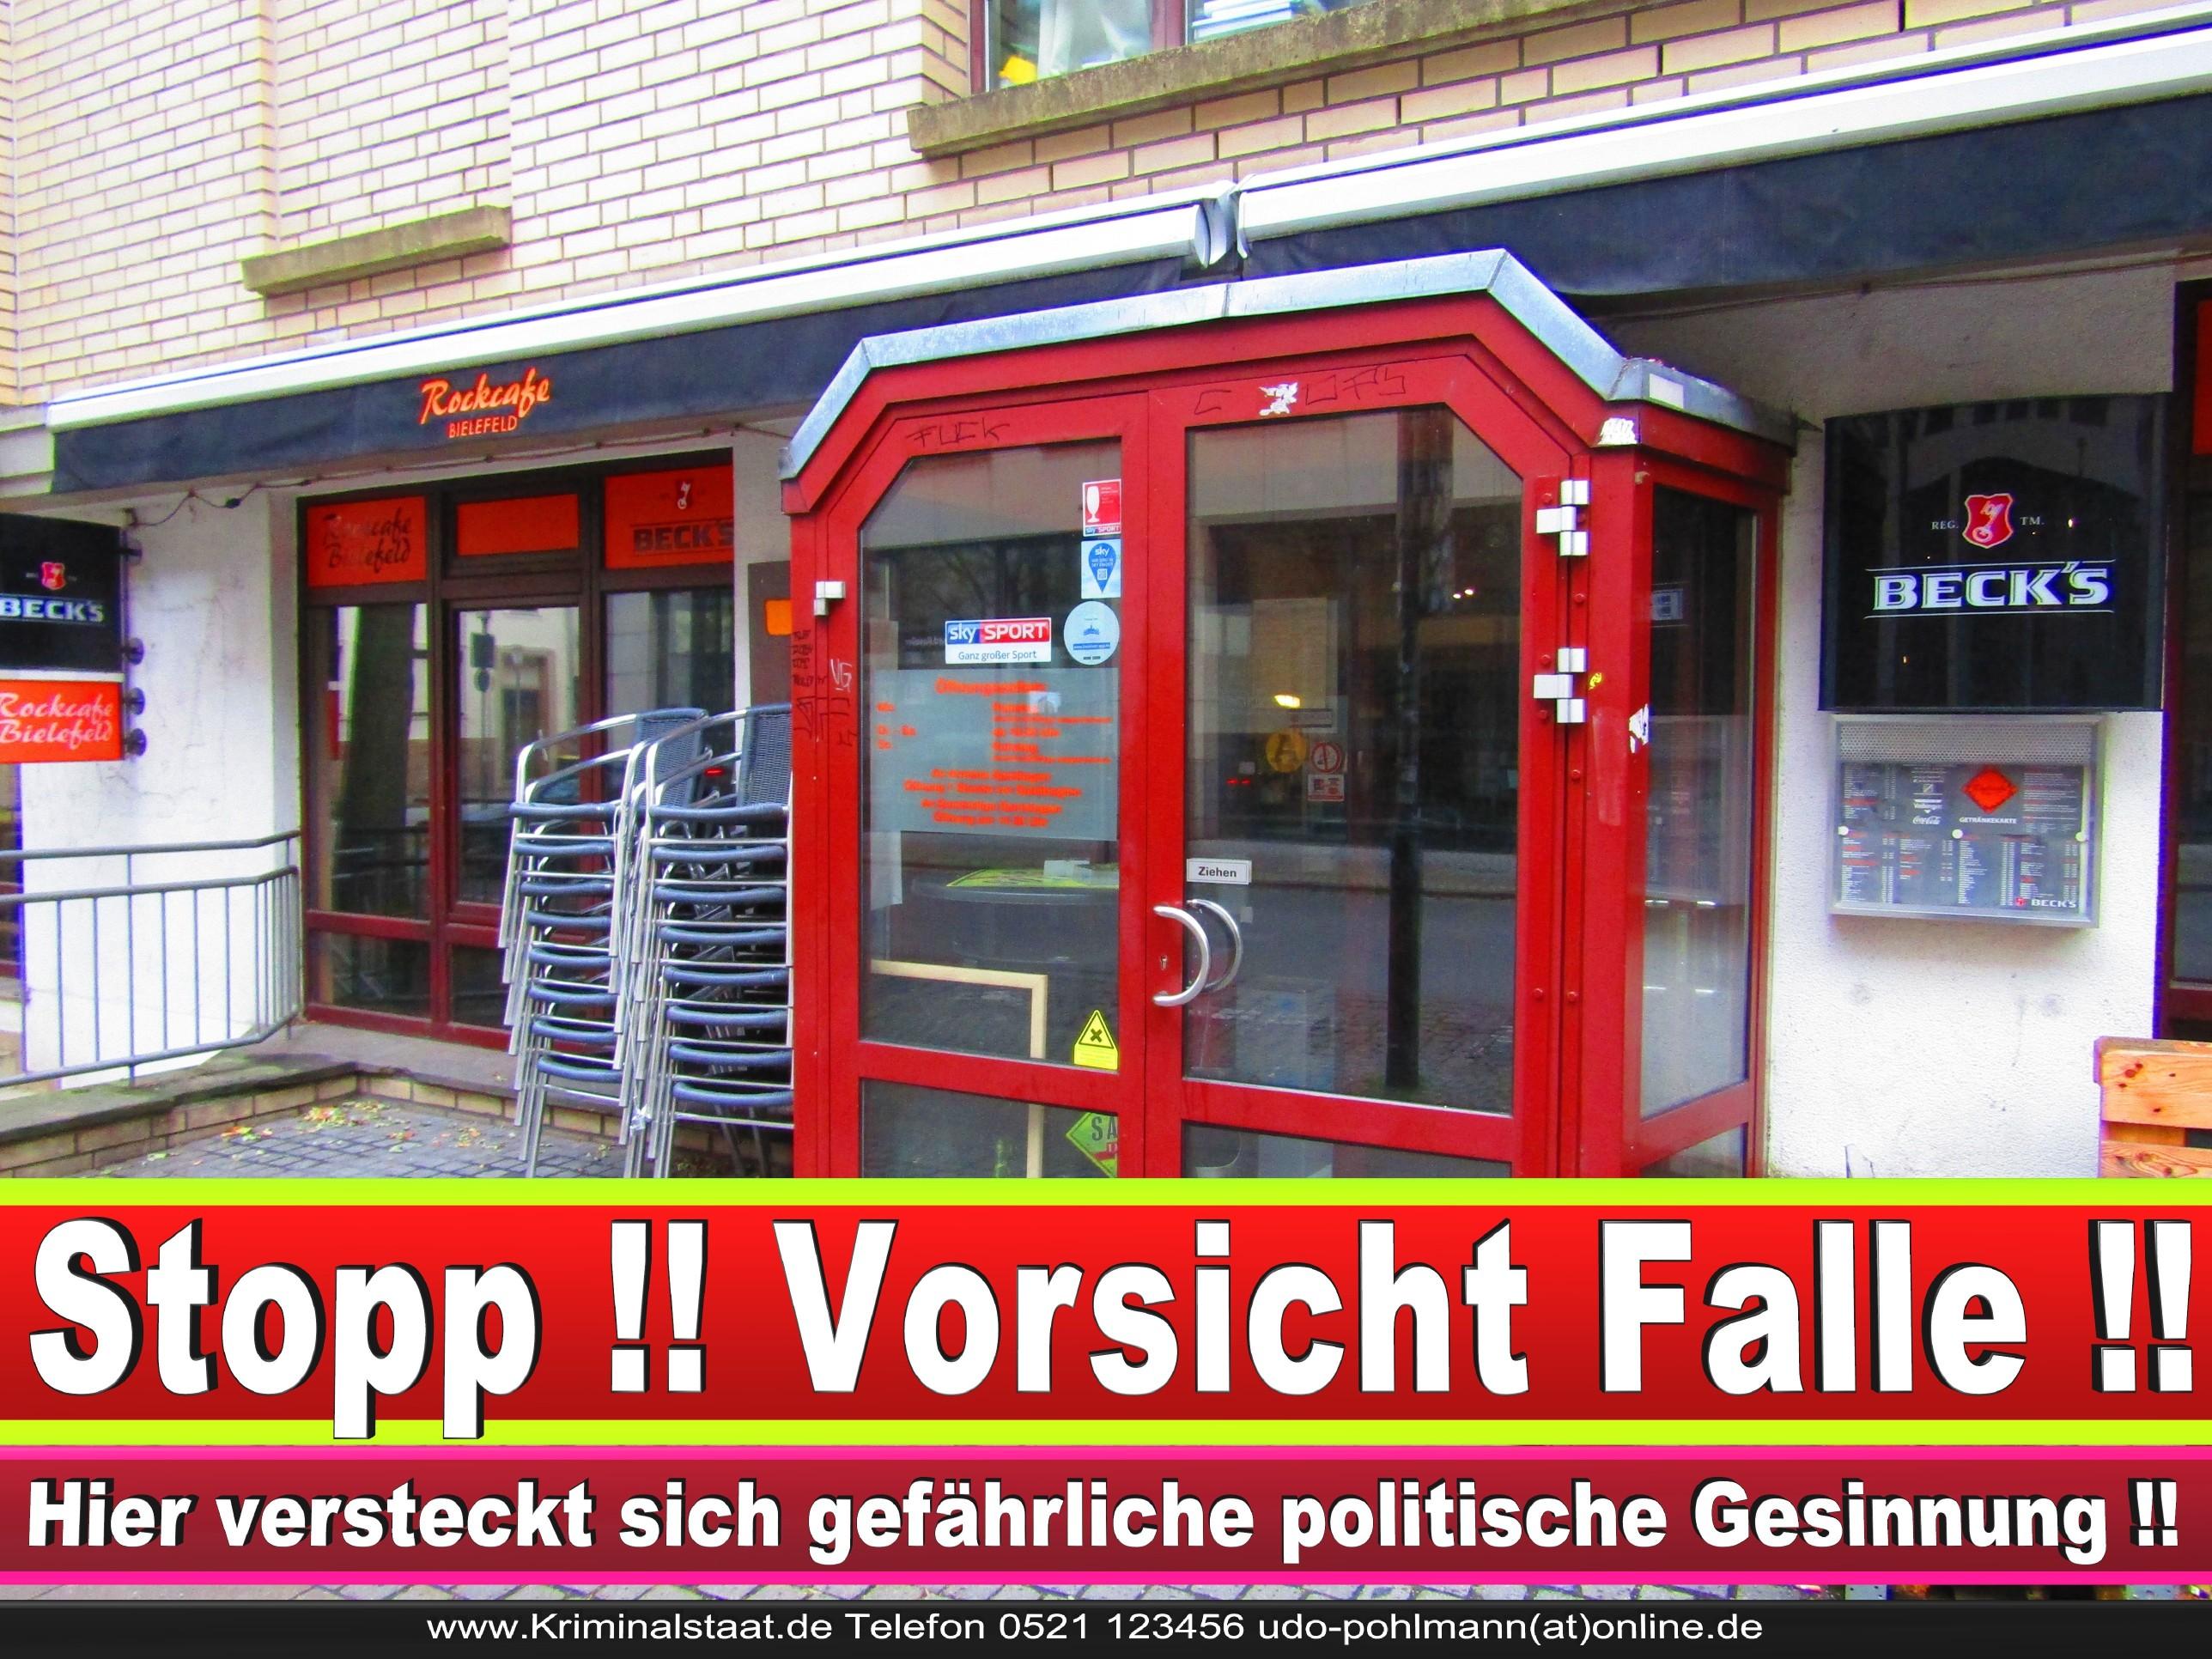 Rockcafe Bielefeld Neustädter Str 25 33602 CDU Bielefeld NRW 8